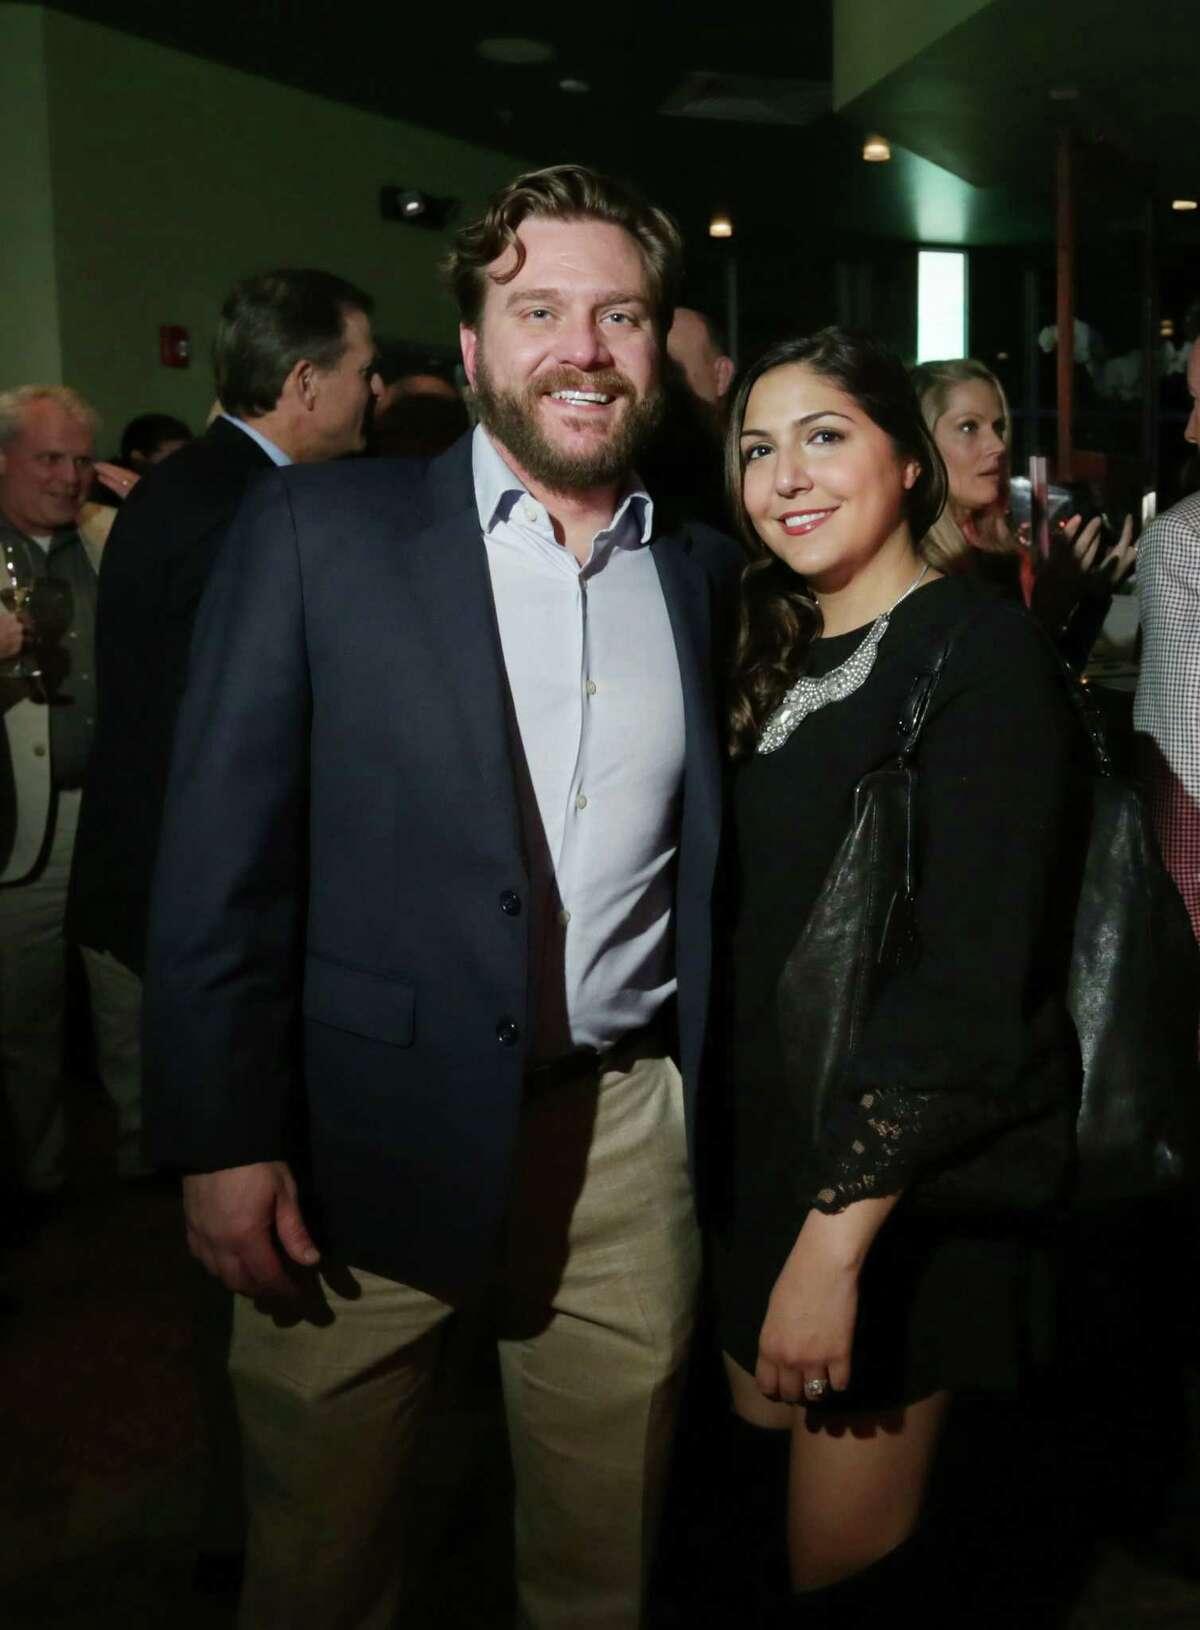 Jake Mase and Sara Abdolpour